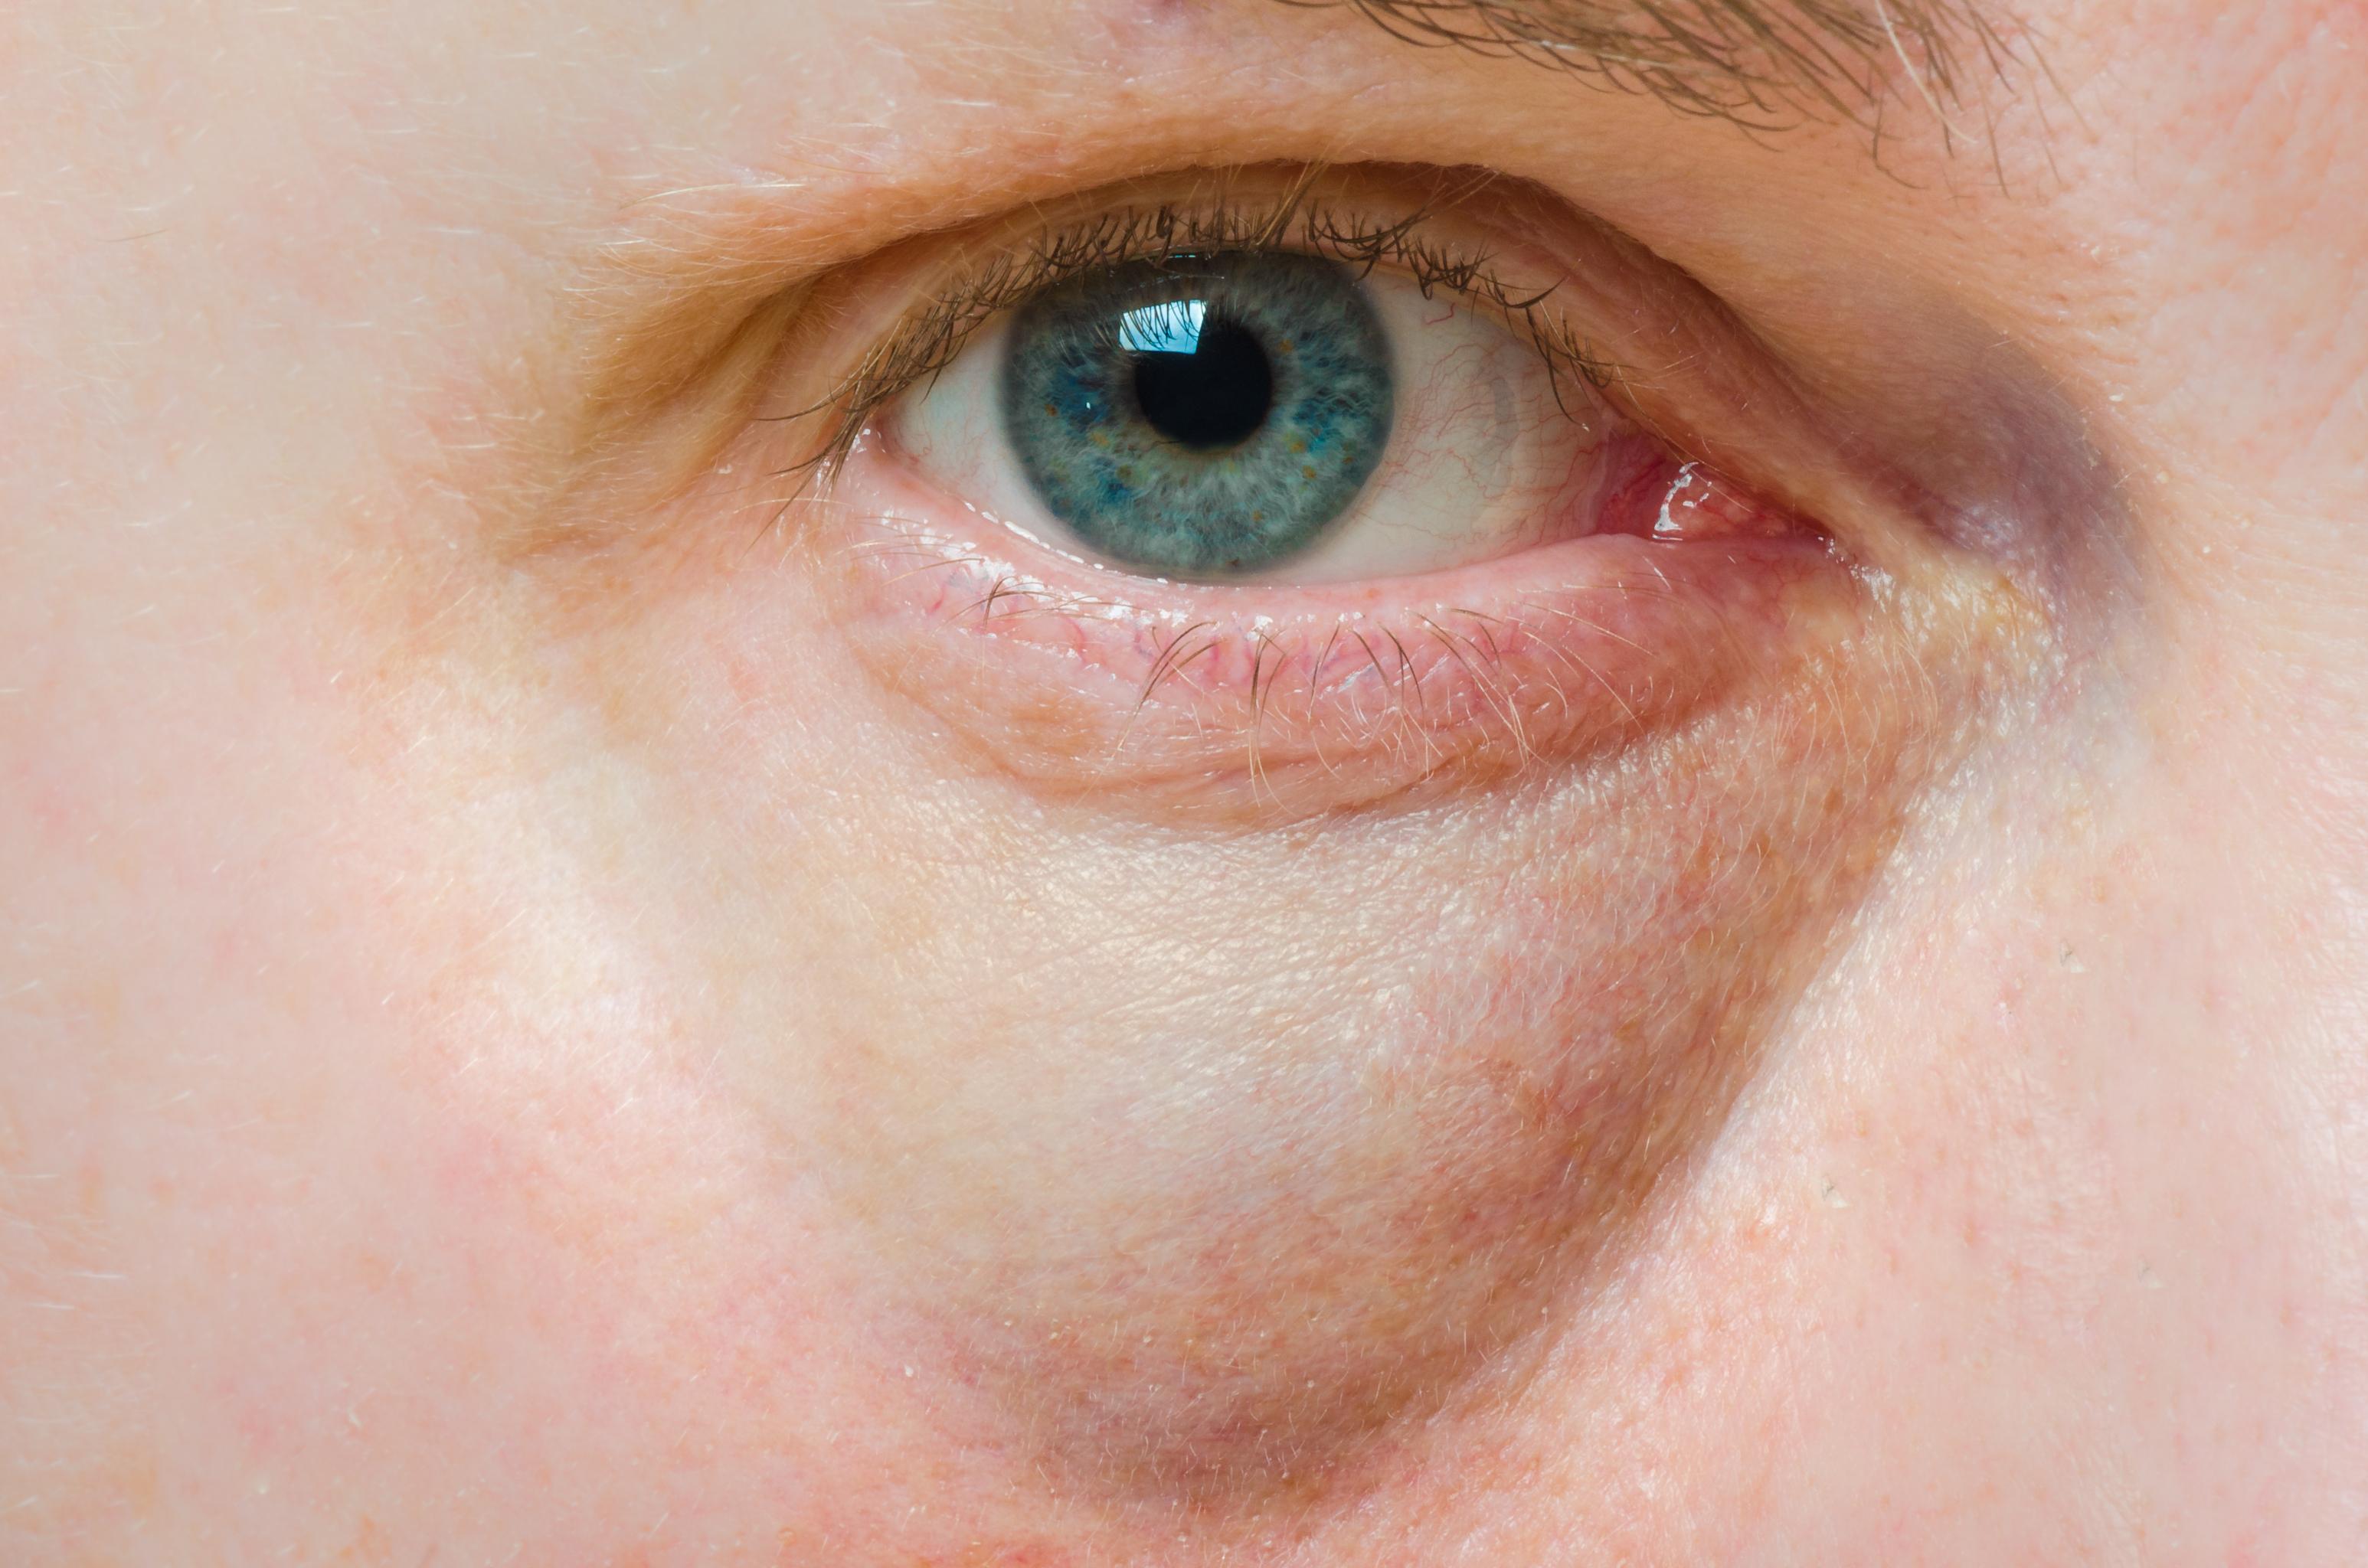 Puffy Swollen Eye